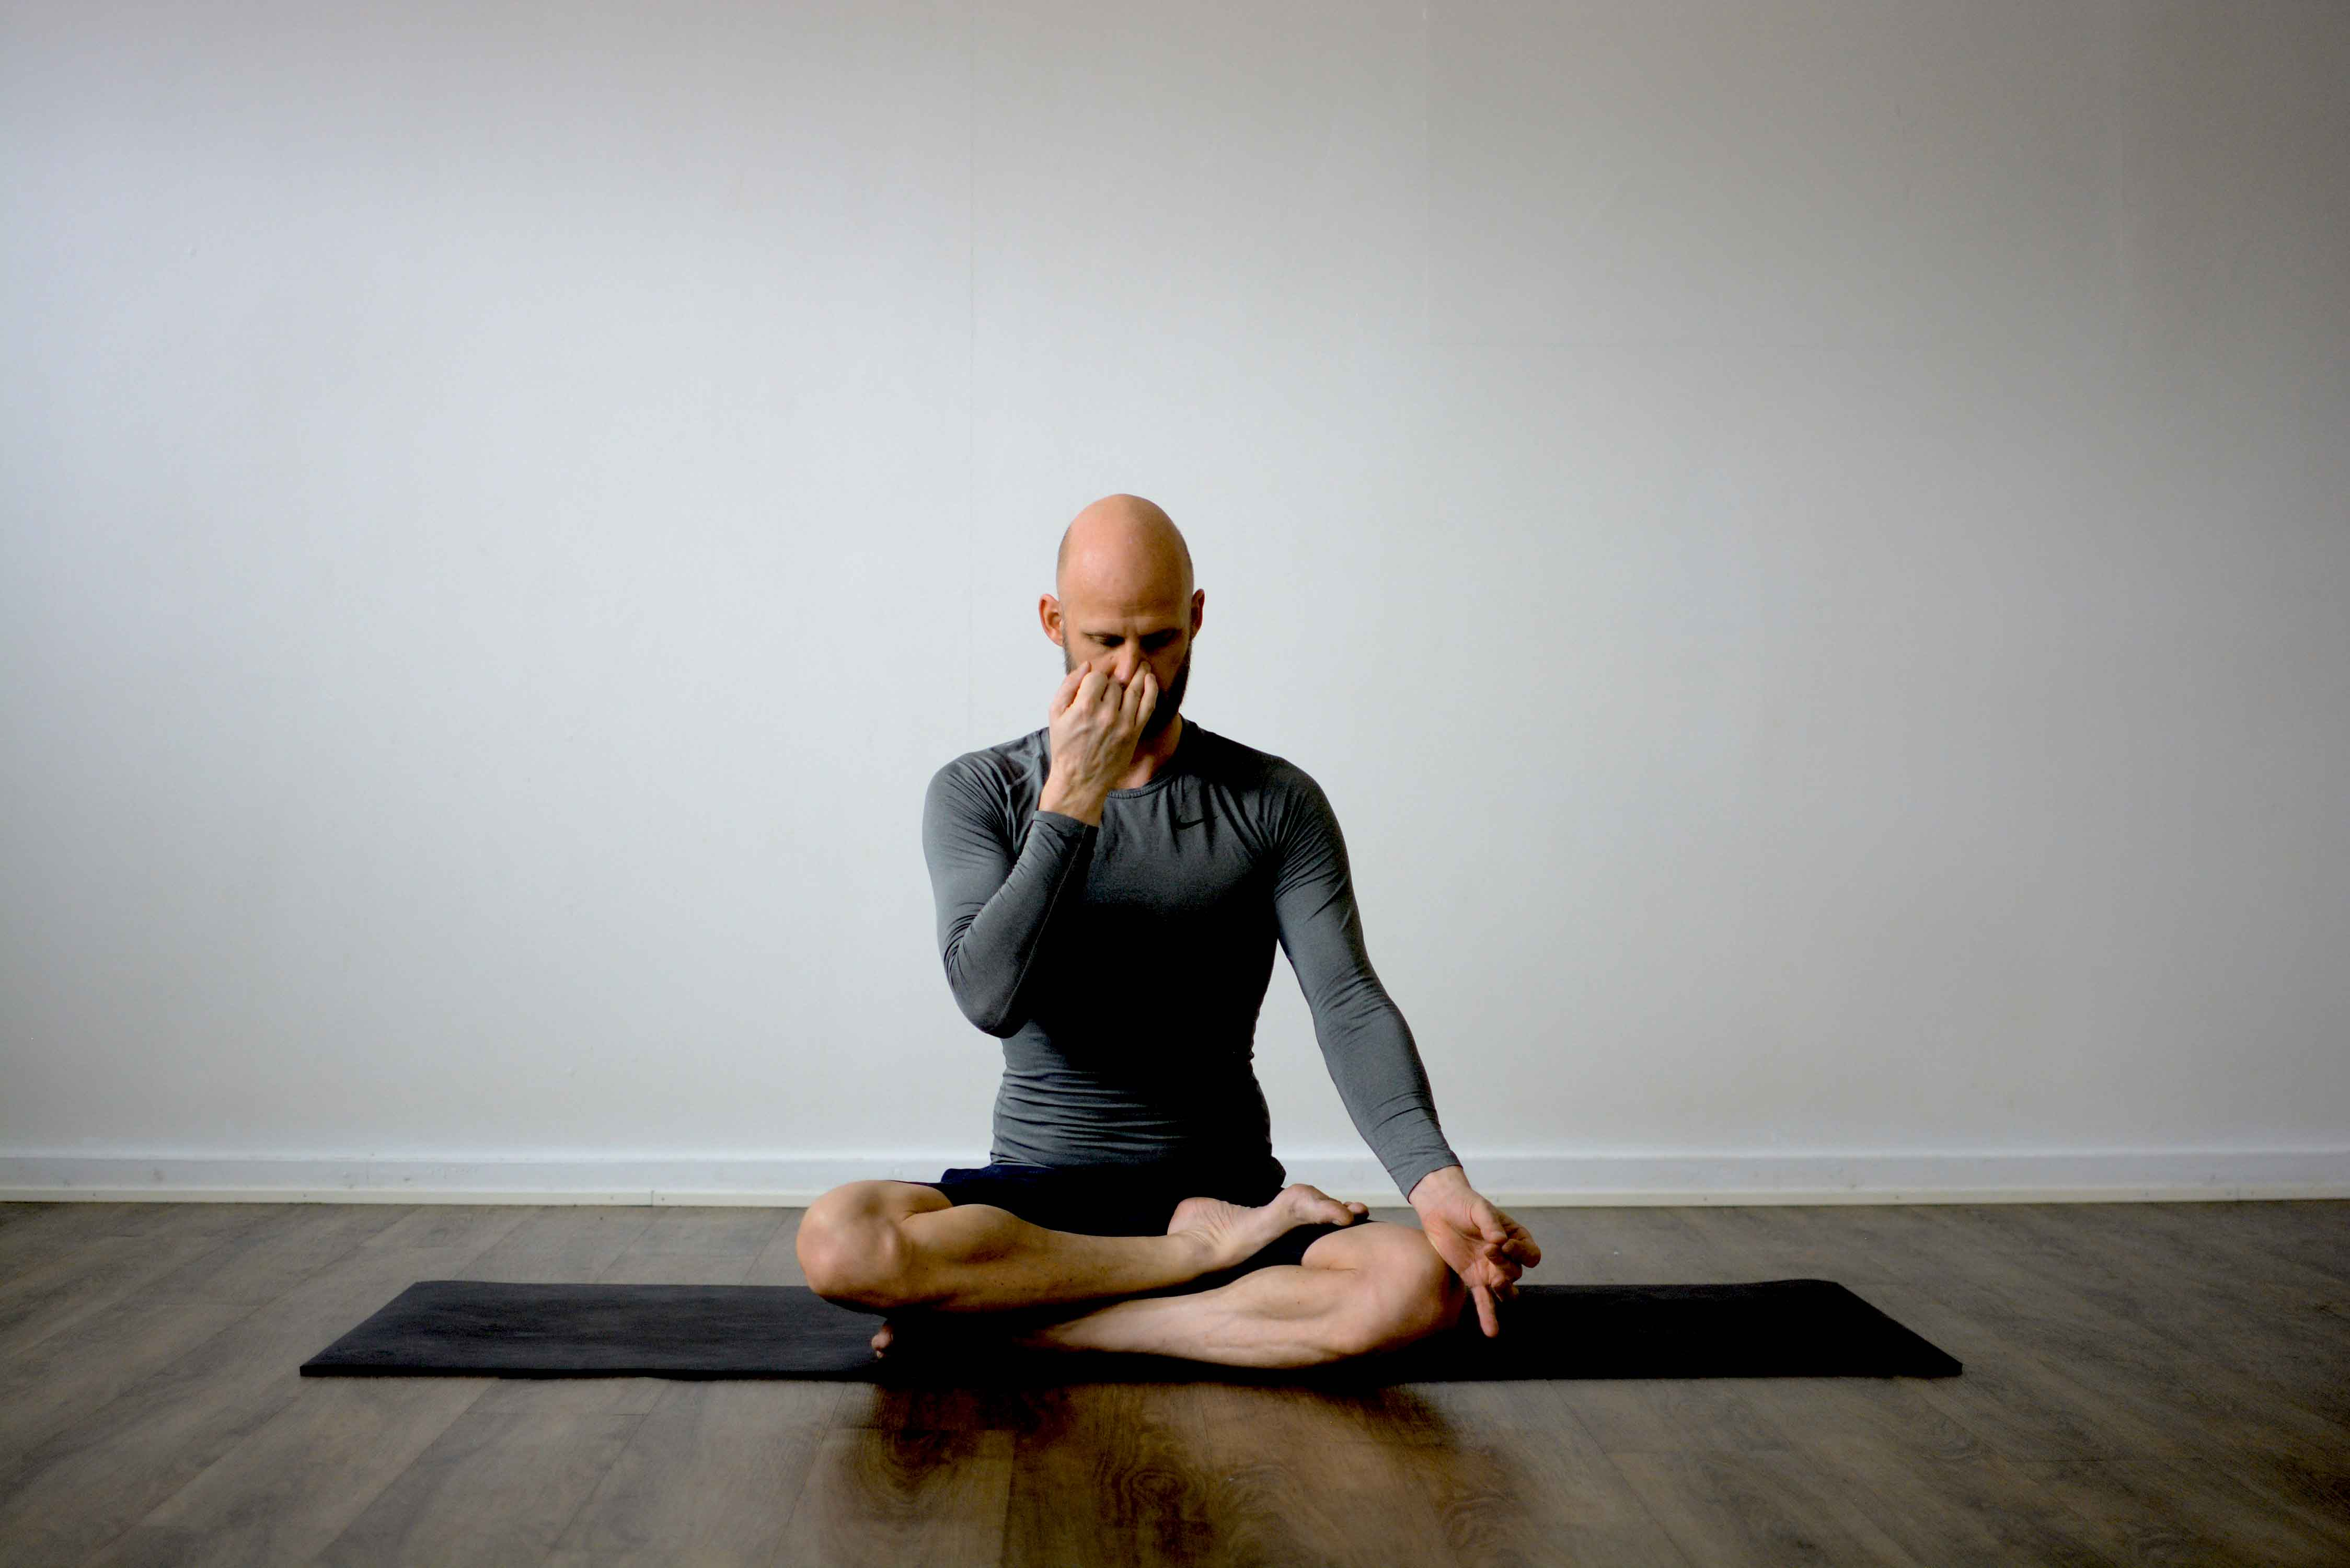 йога пранаяма картинки